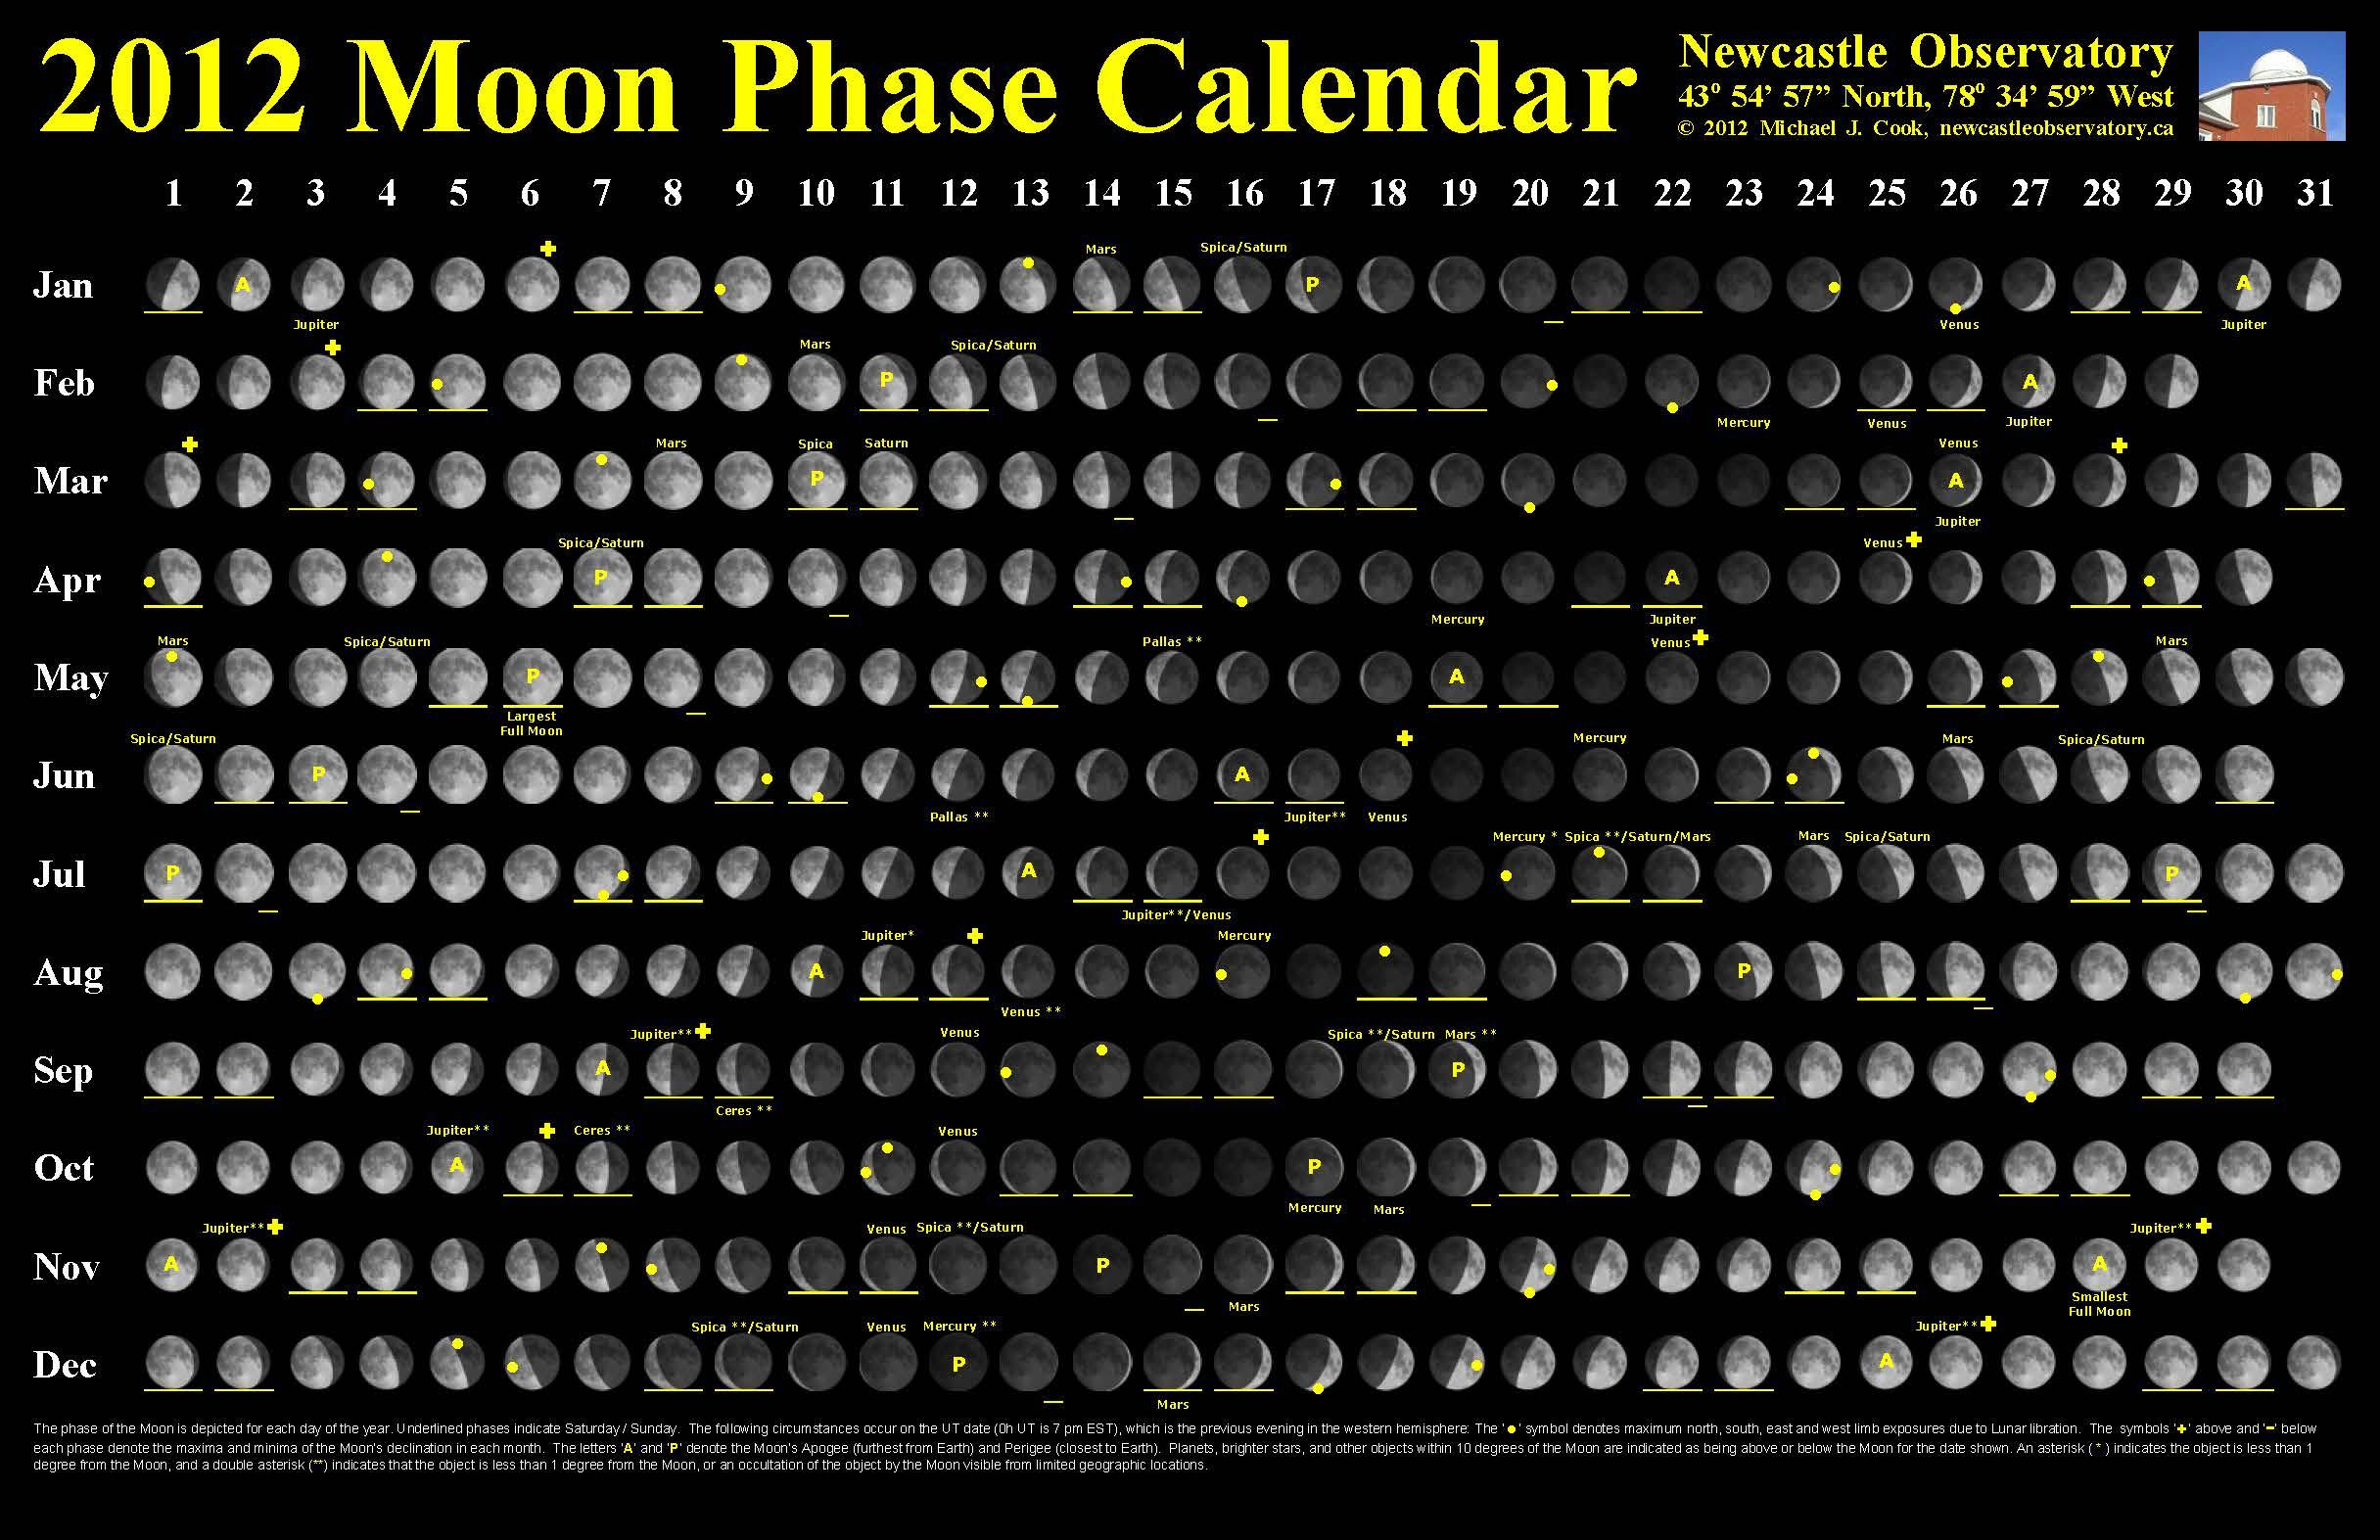 Year Calendar Look : City crows calendar u june hunter images